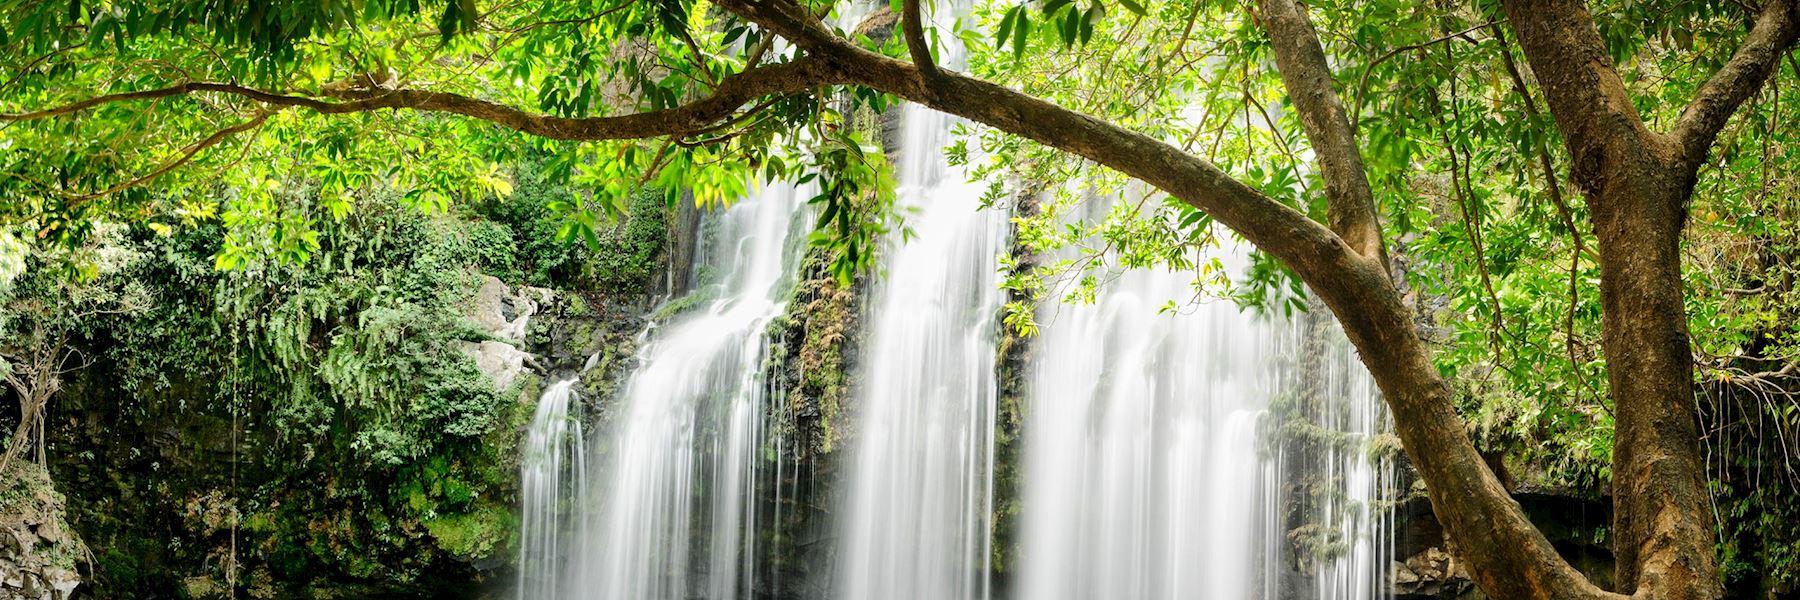 Costa Rica travel guides